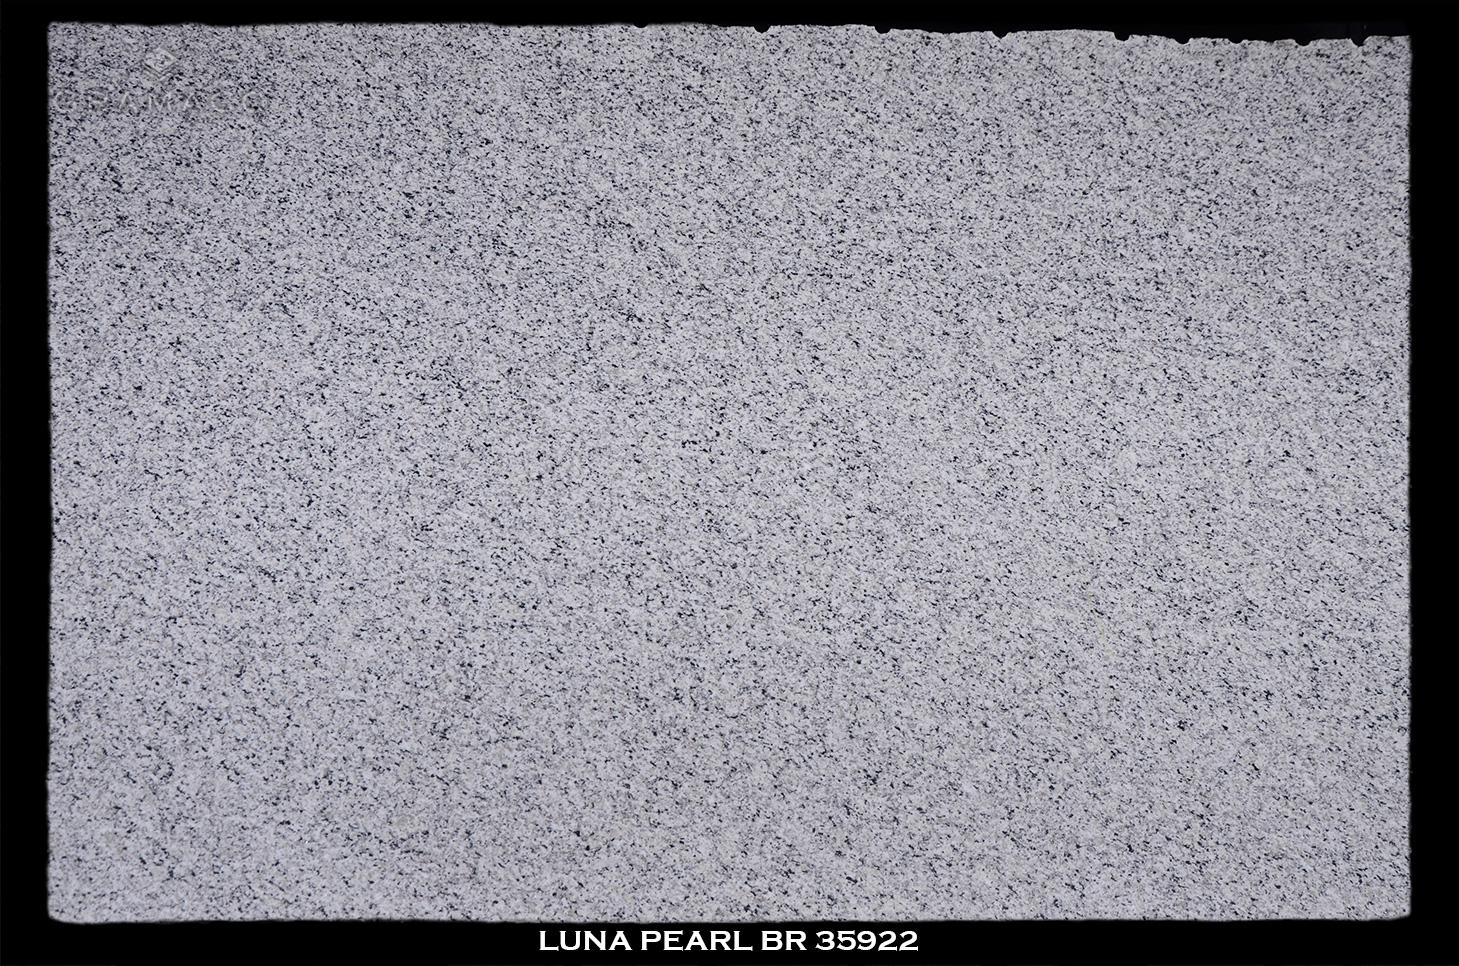 luna-pealr-br-35922